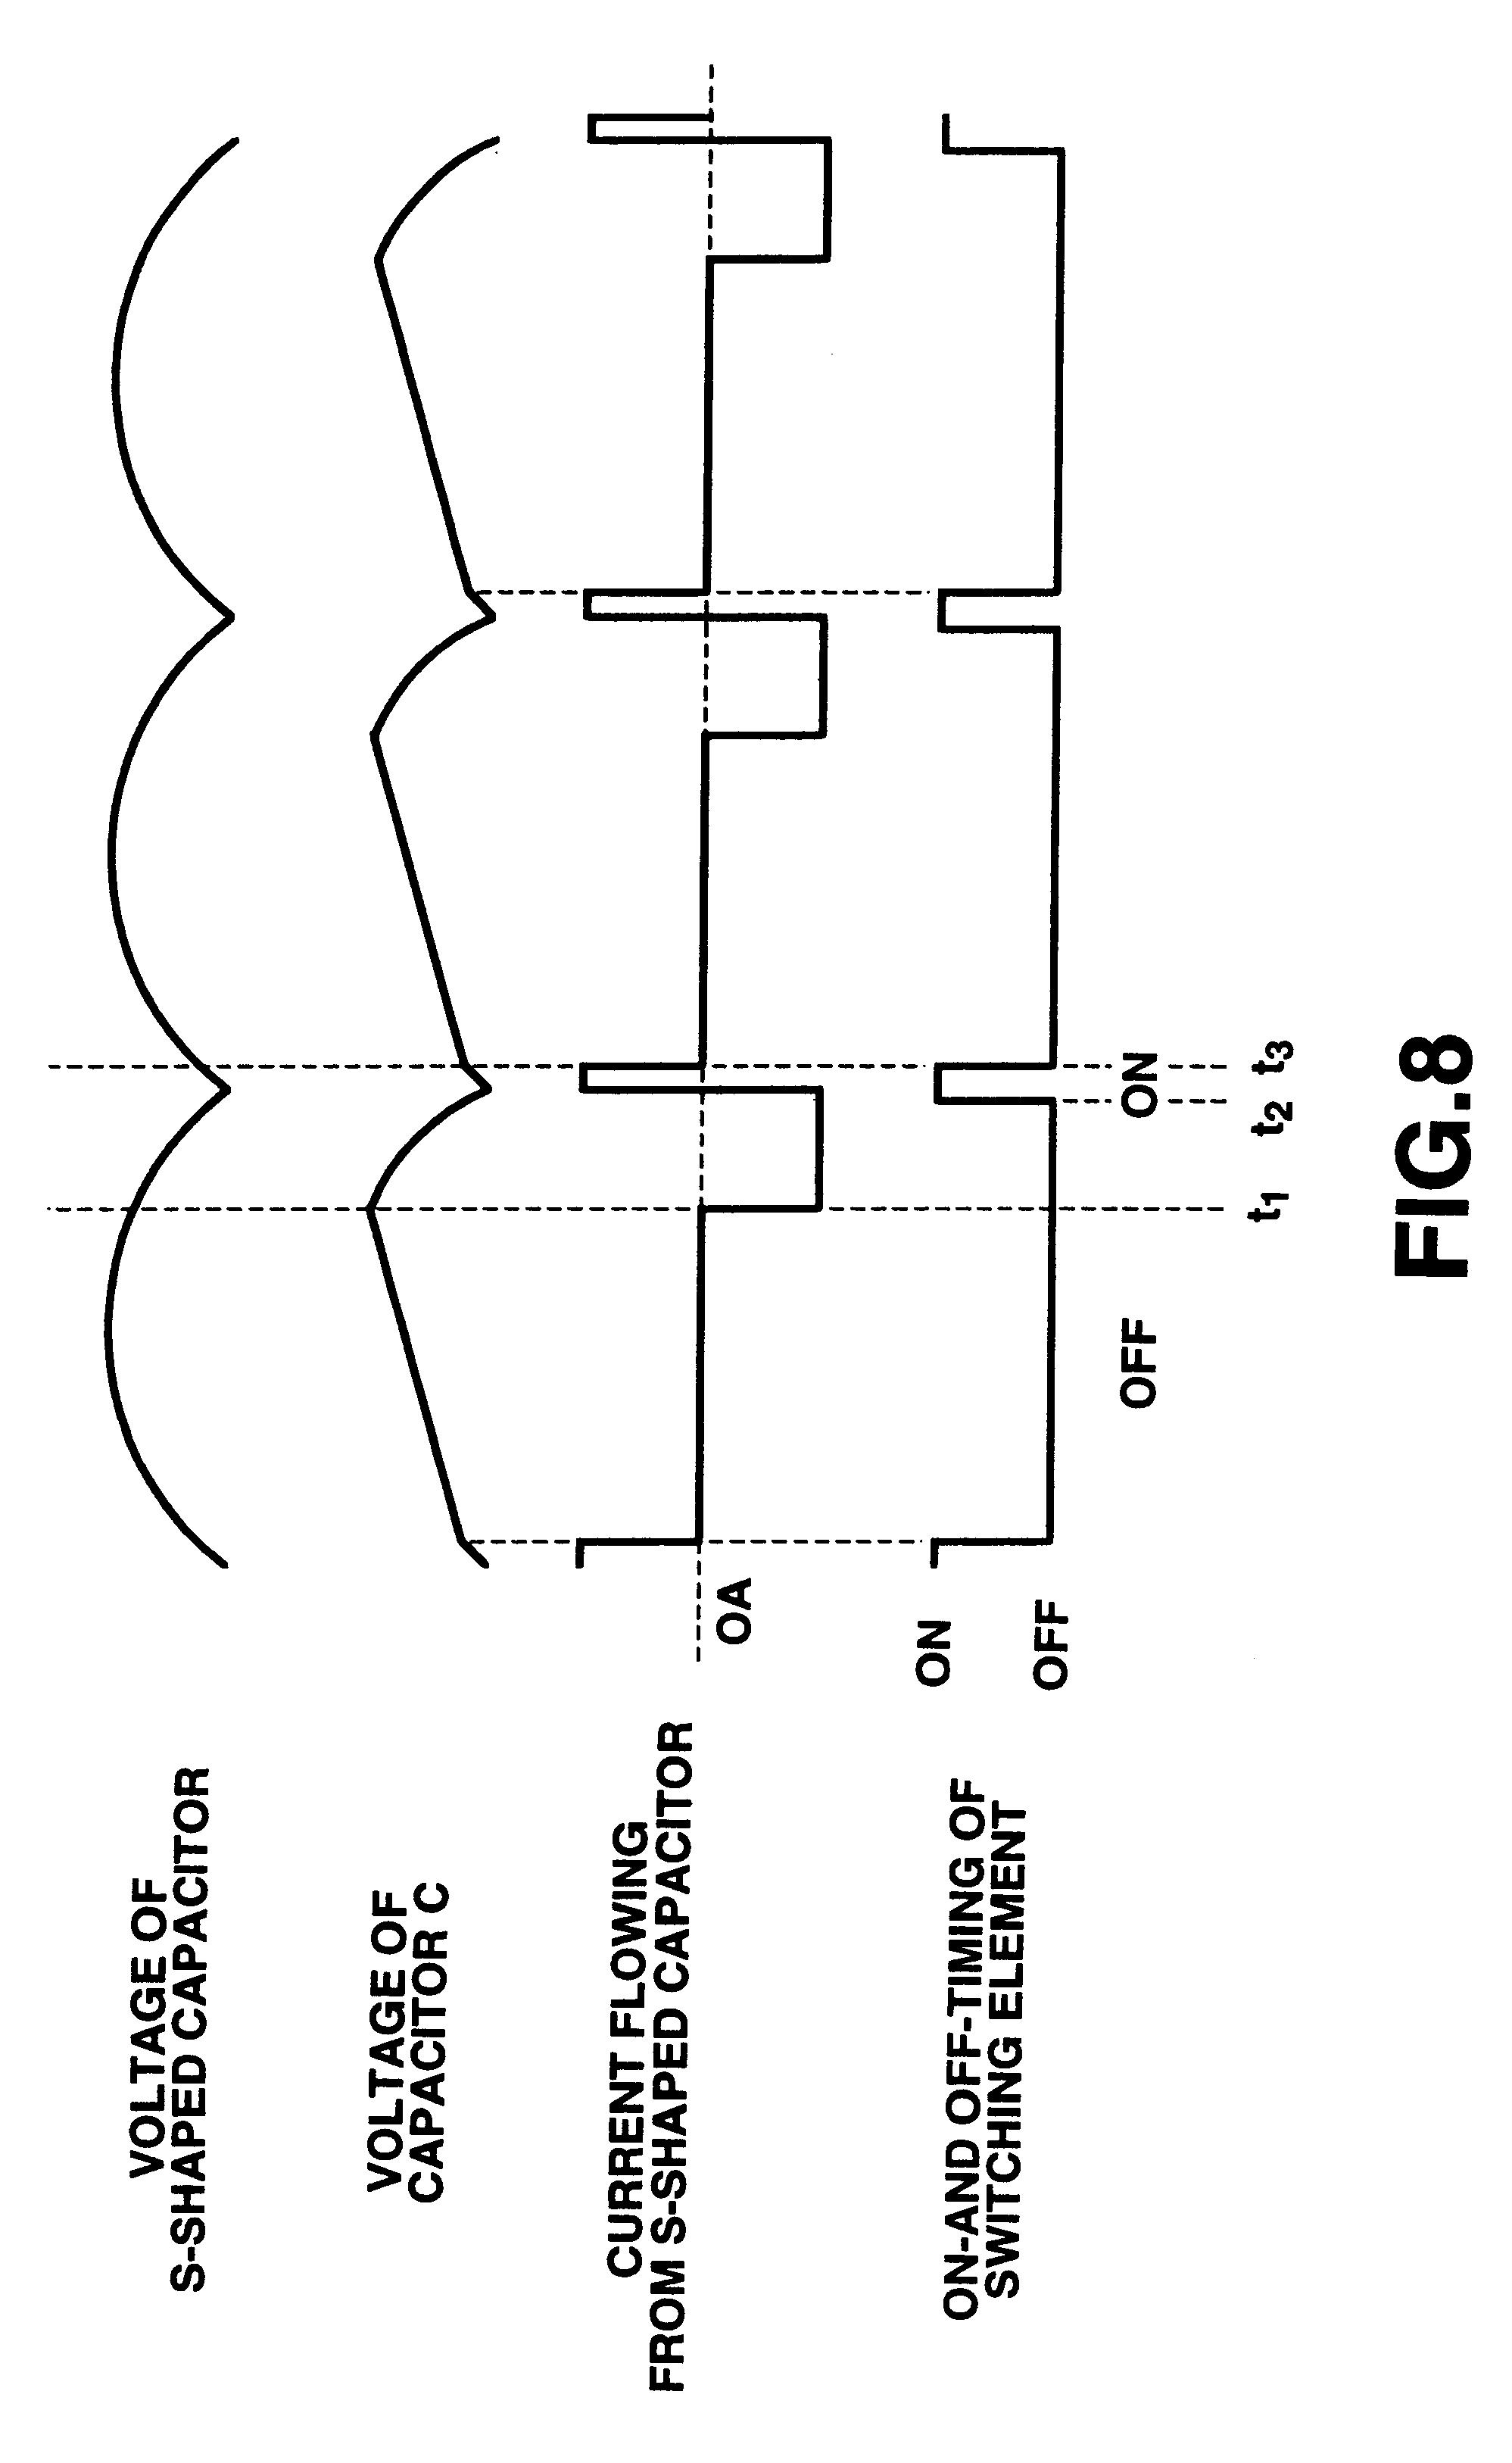 Brevet Us6384548 Horizontal Deflection Circuit Google Brevets Capacitor Timer Patent Drawing